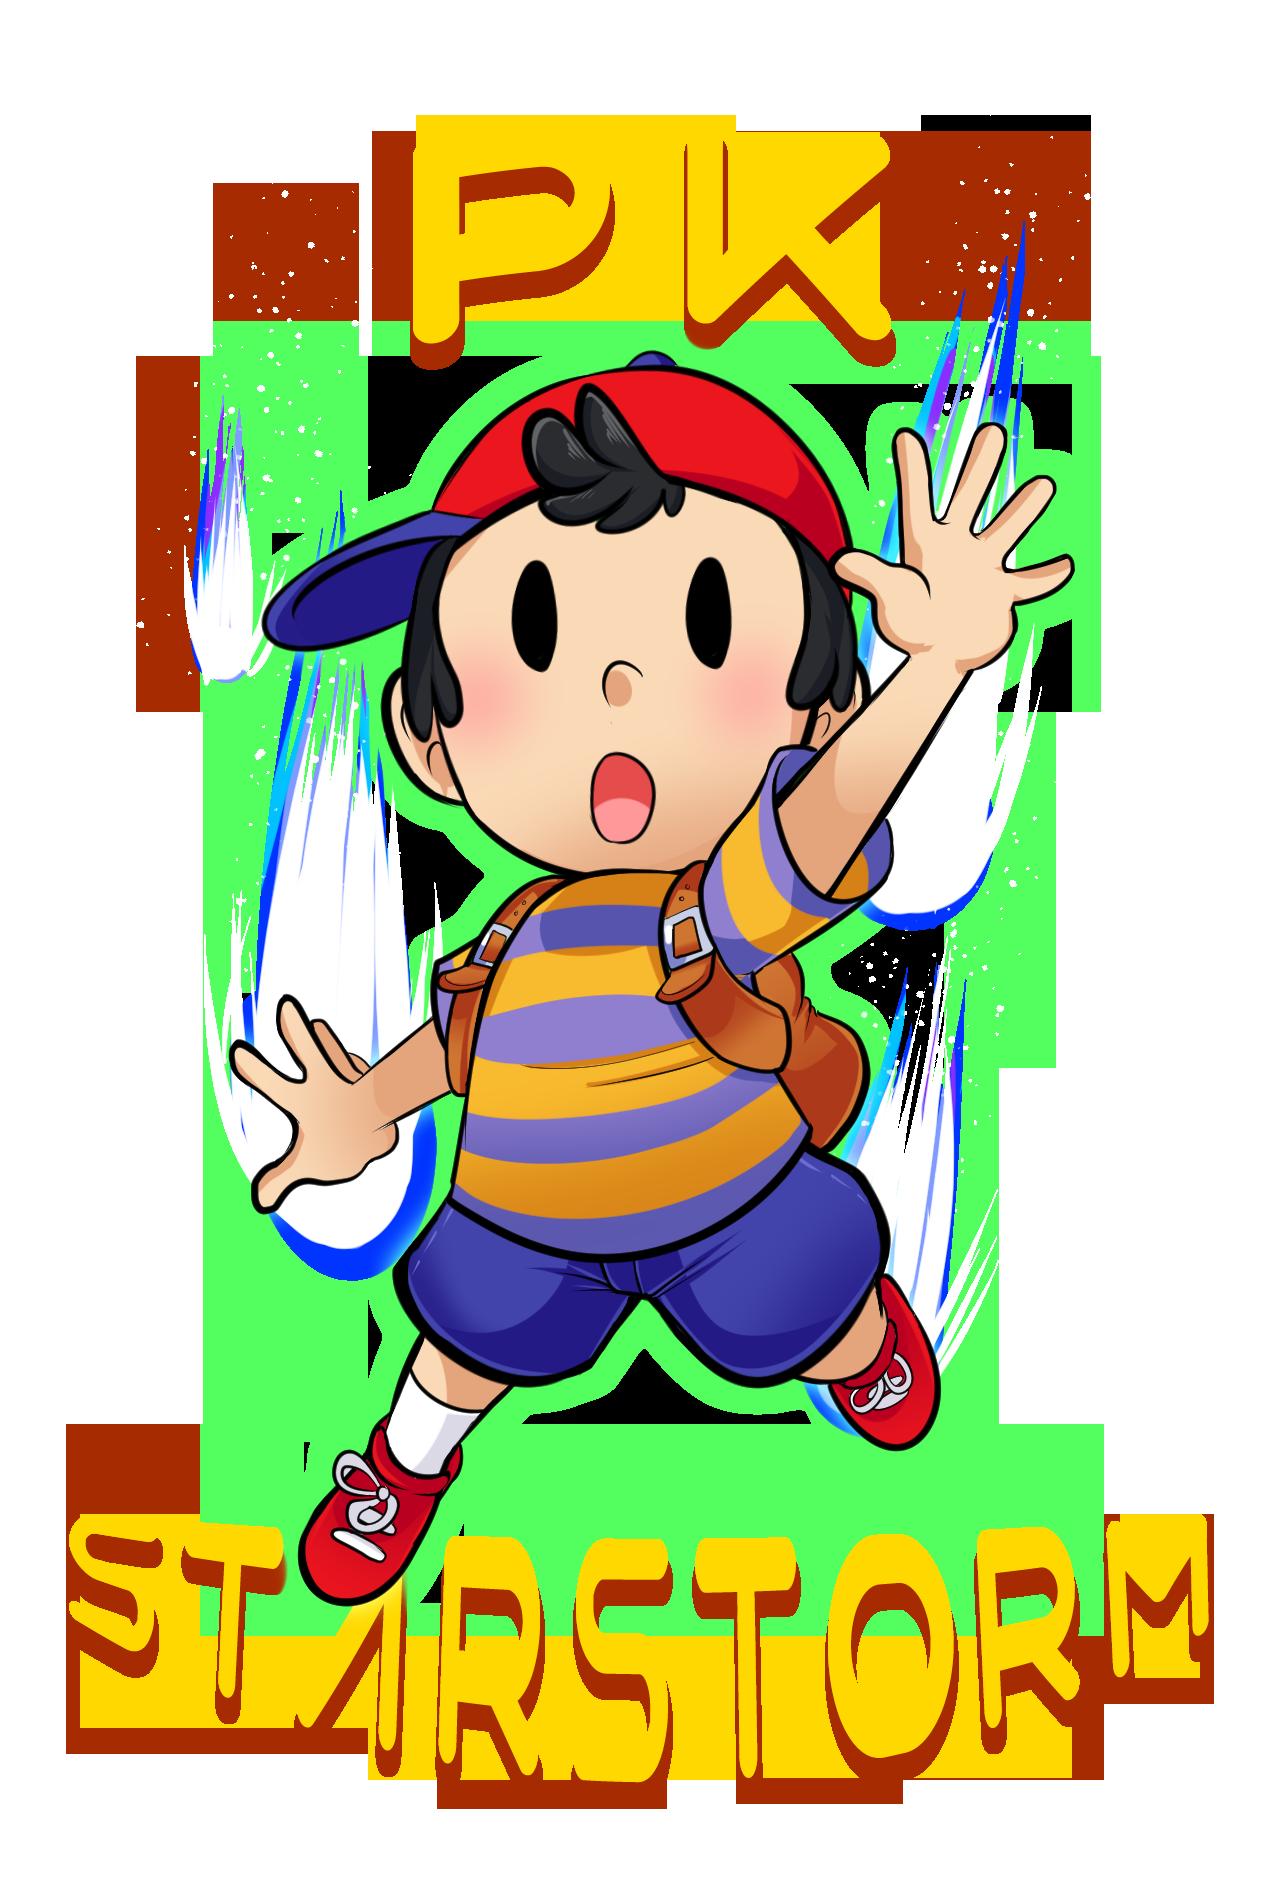 .: PK Starstorm :.